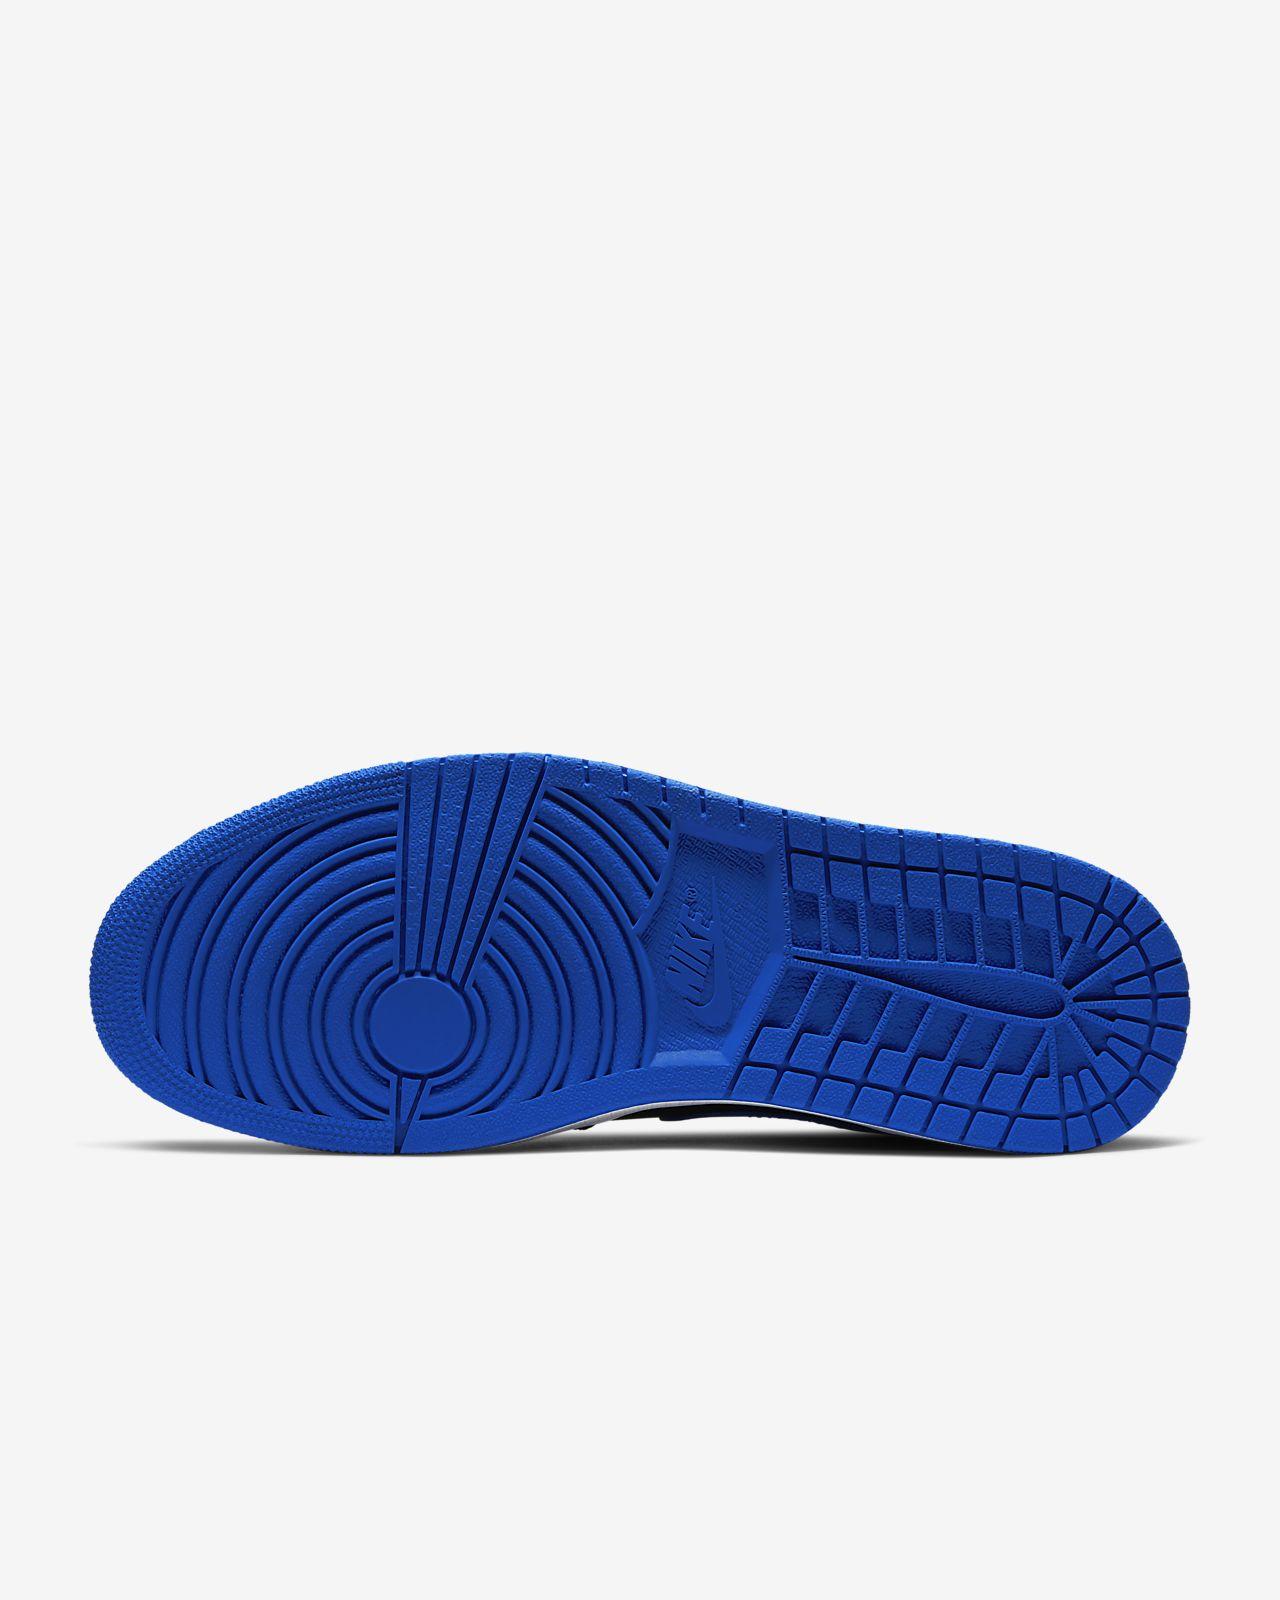 Classic Nike Shoes Sale: Nike Dunk High Kids Nike RedBlack